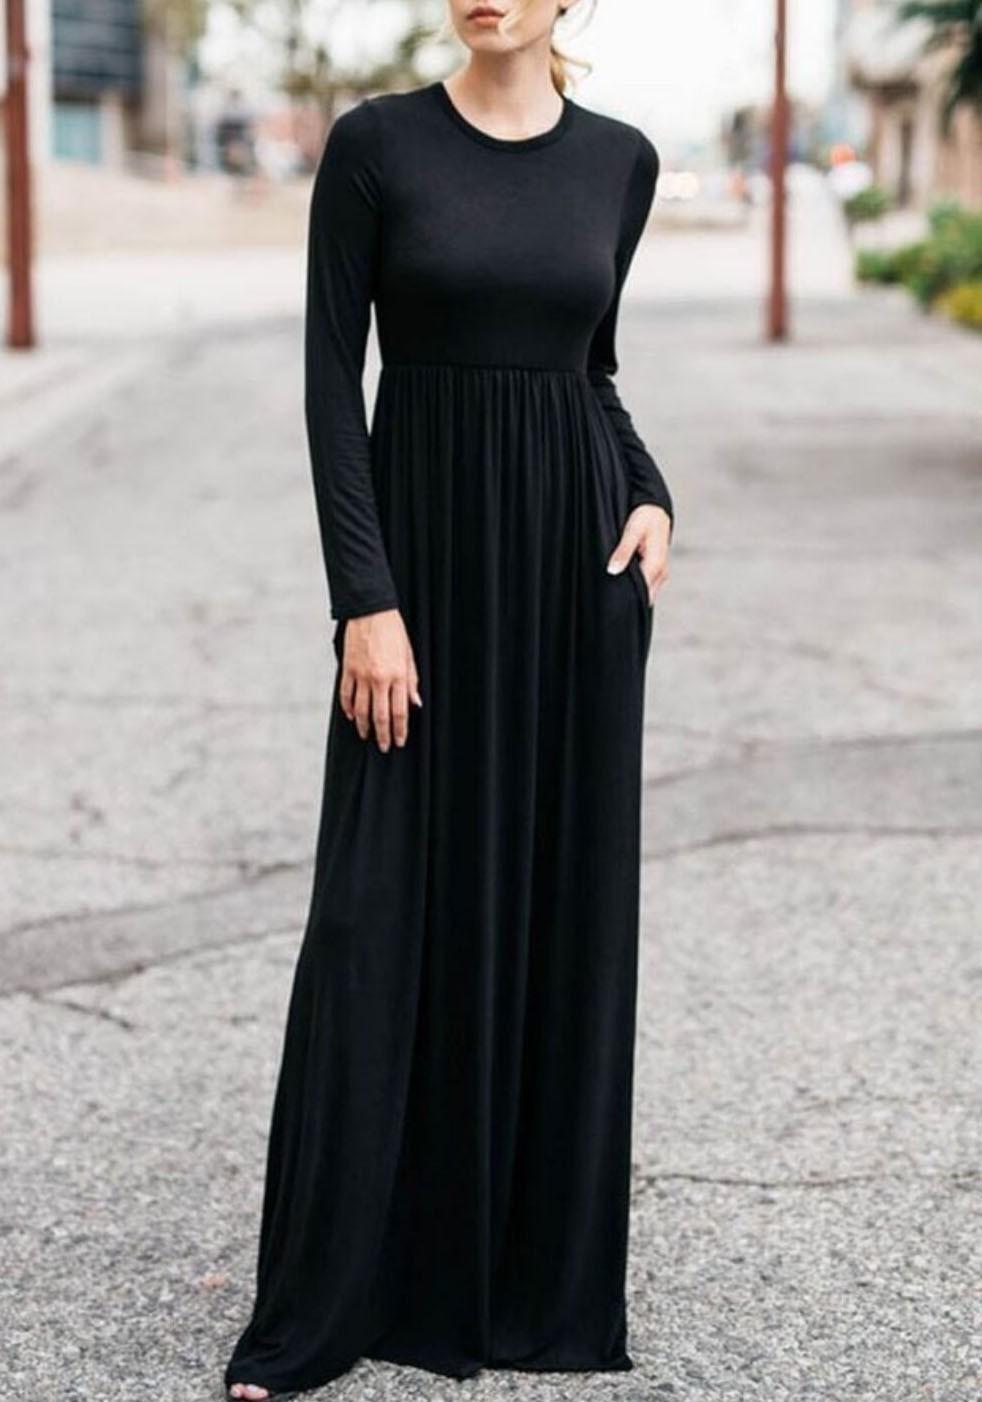 Formal Perfekt Abendkleider Lang Und Günstig SpezialgebietAbend Elegant Abendkleider Lang Und Günstig Ärmel